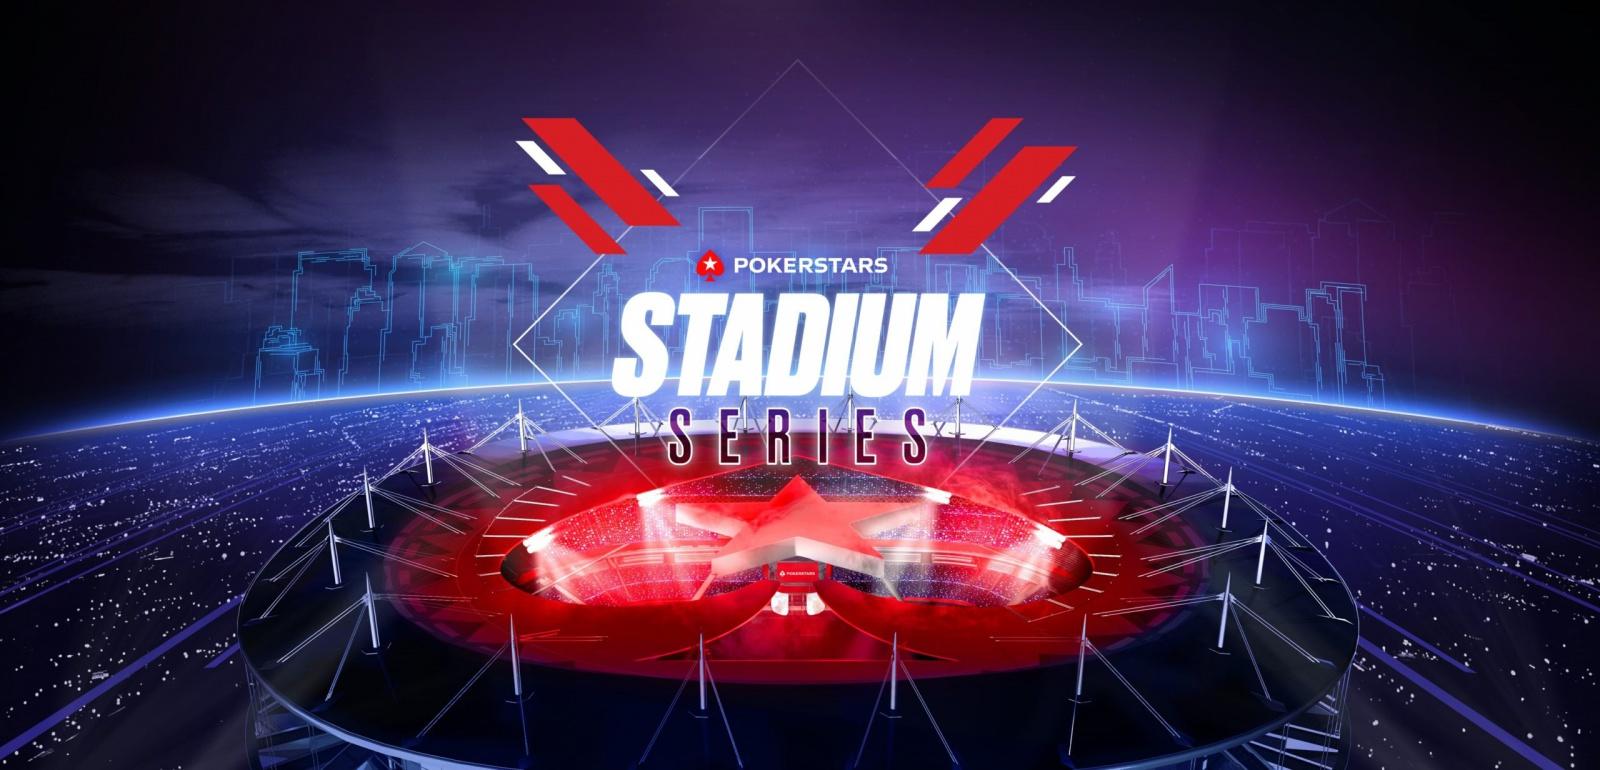 stadium_series-1-scaled.thumb.jpg.04c9c6d63625b3e1f7364c4a01c2a85a.jpg